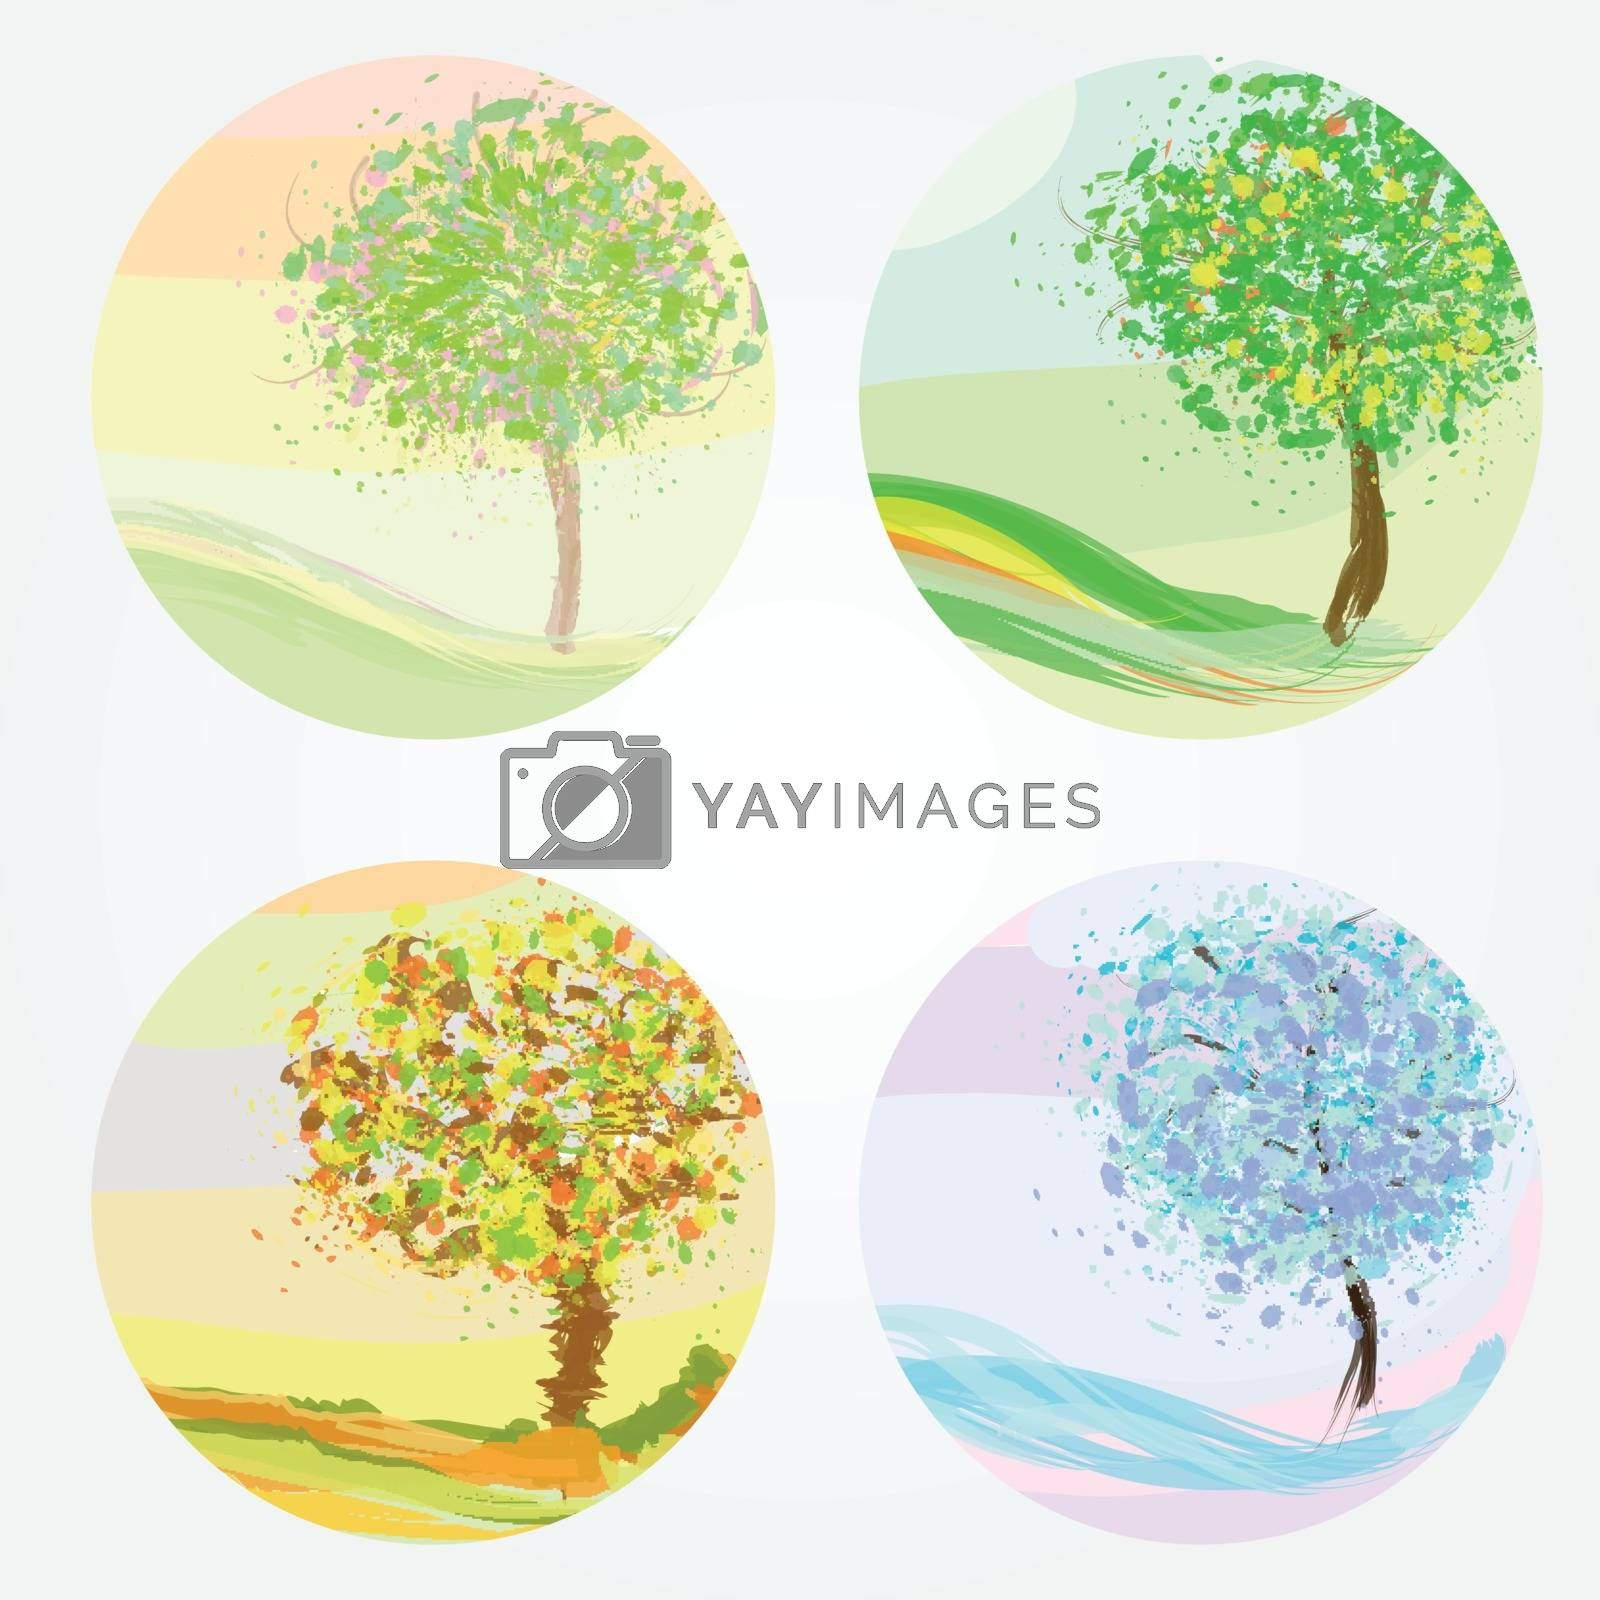 Four seasons - spring, summer, autumn, winter. Vector illustration for your design